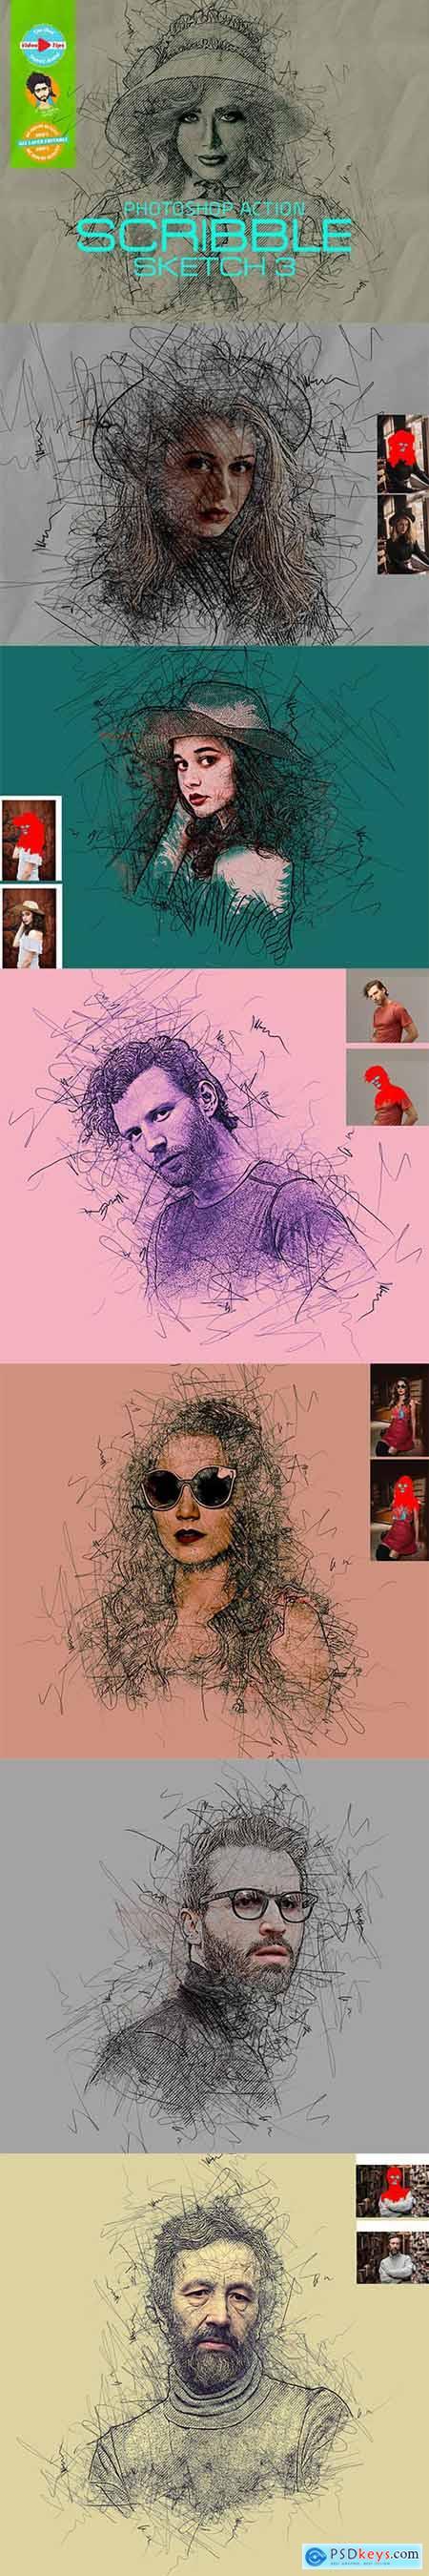 Scribble Sketch Photoshop Action 5953854